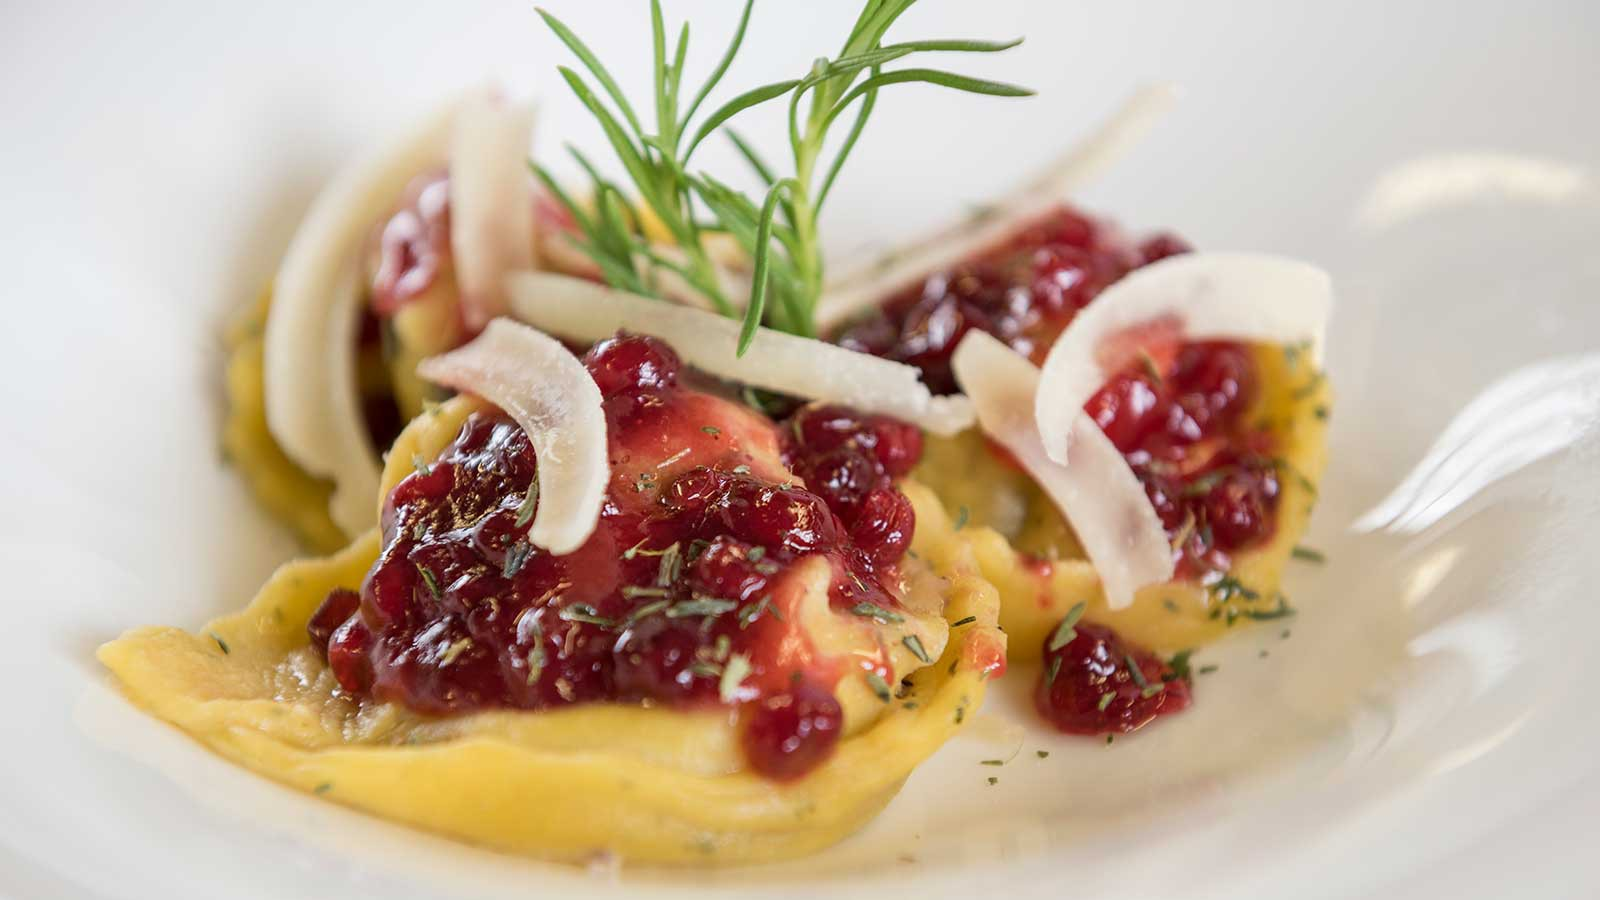 Alpenheim Charming Hotel - Food